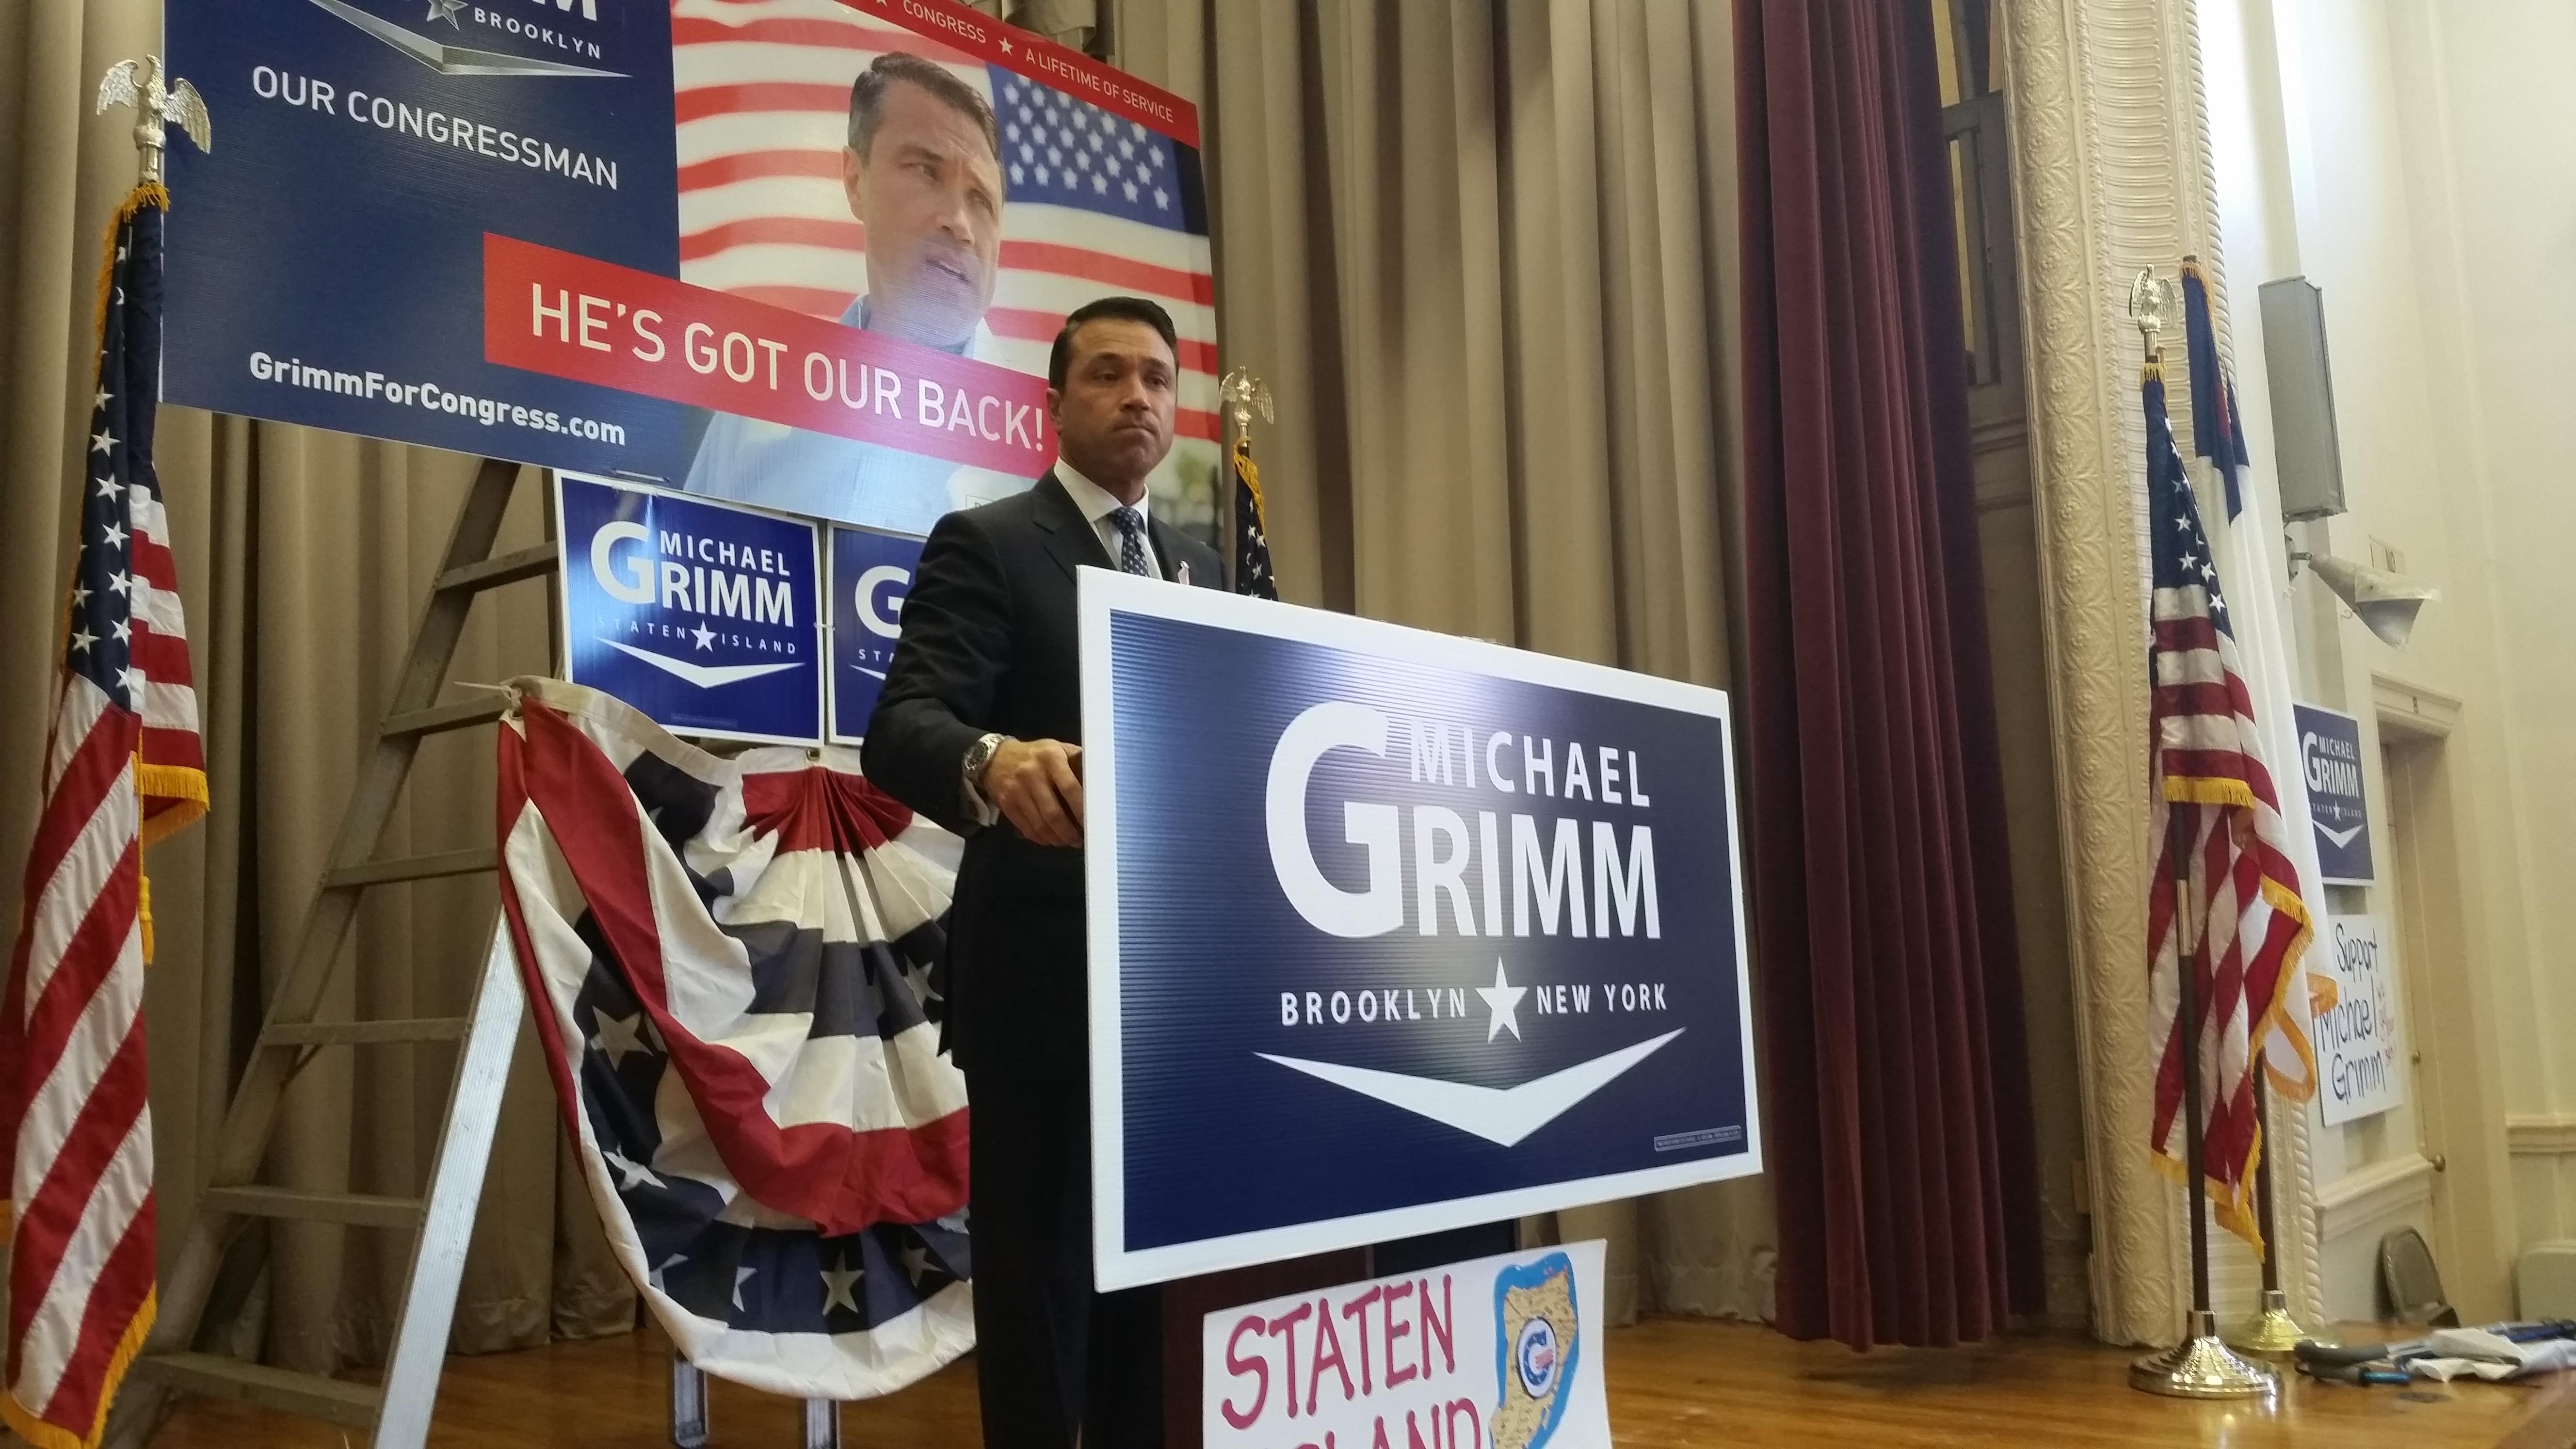 Congressman Michael Grimm on Saturday. (Photo: Ross Barkan)